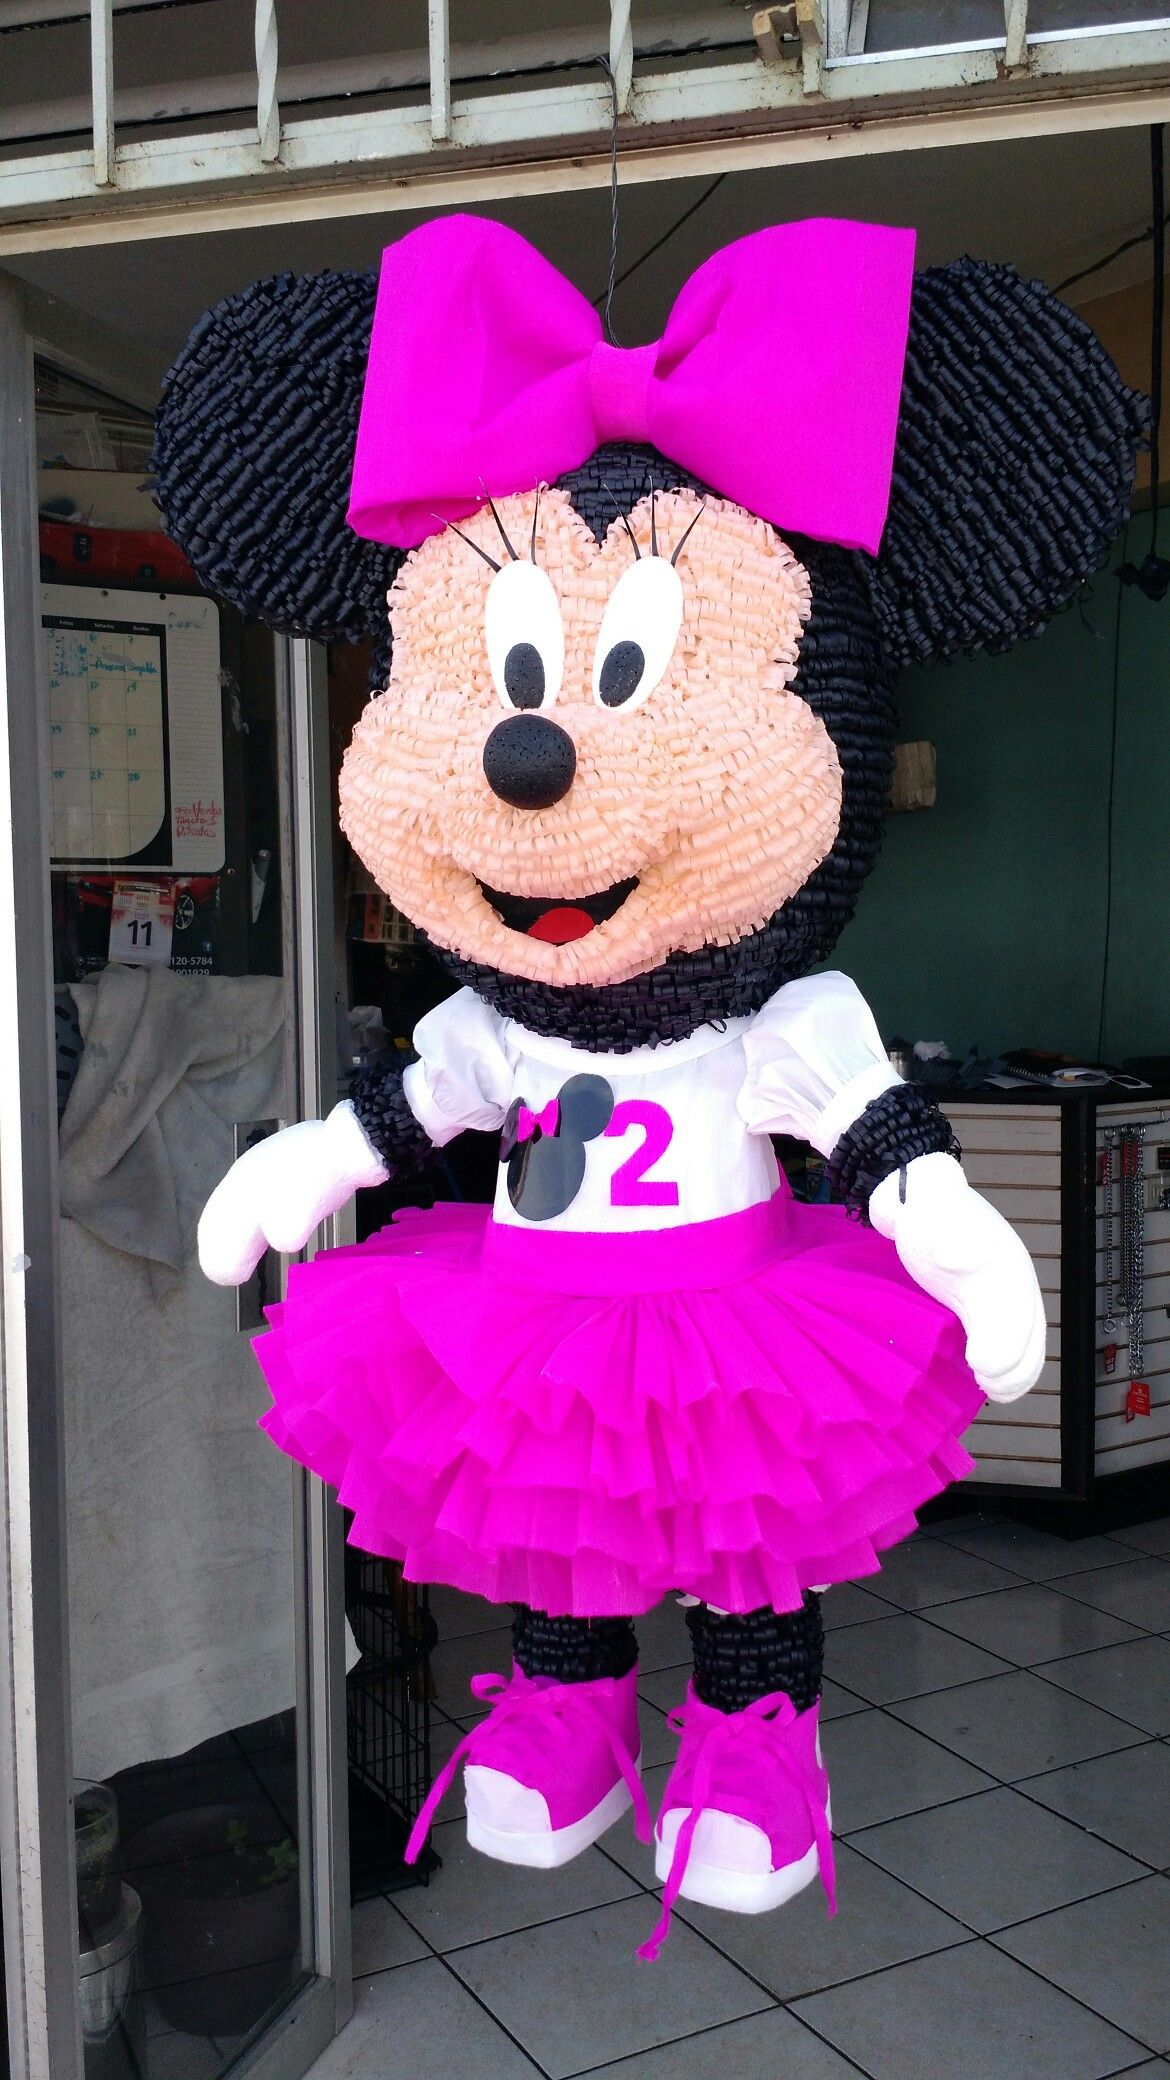 Piñata Minnie Mouse | piñatas | Pinterest | Pinata basteln und Basteln